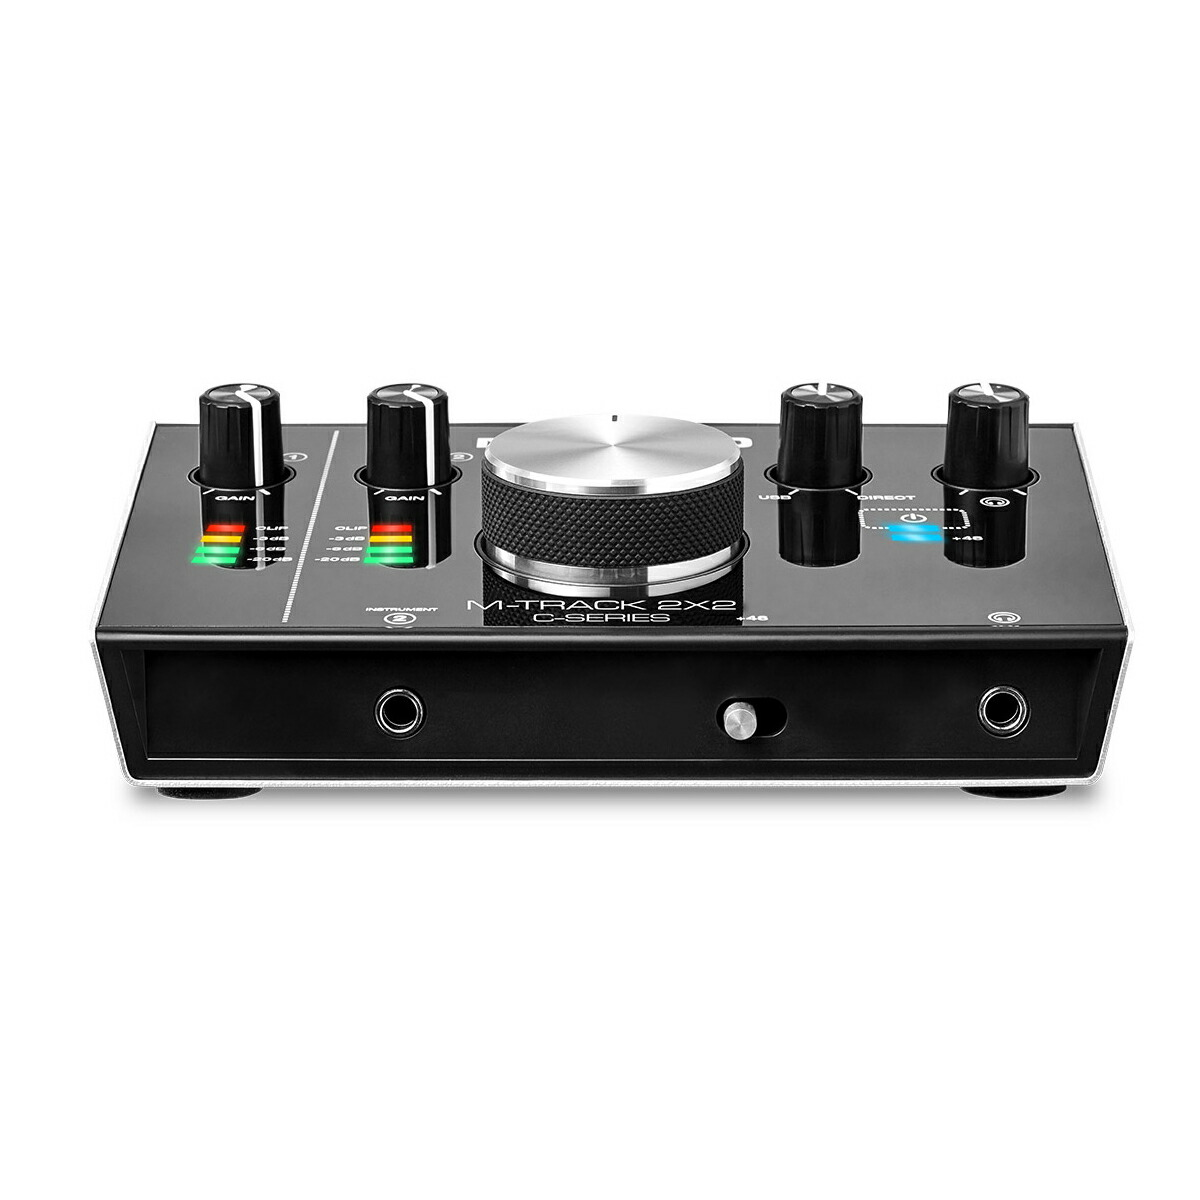 M-AUDIO M-TRACK 2x2 オーディオインターフェイス 【Mオーディオ】 【梅田ロフト店】 画像一